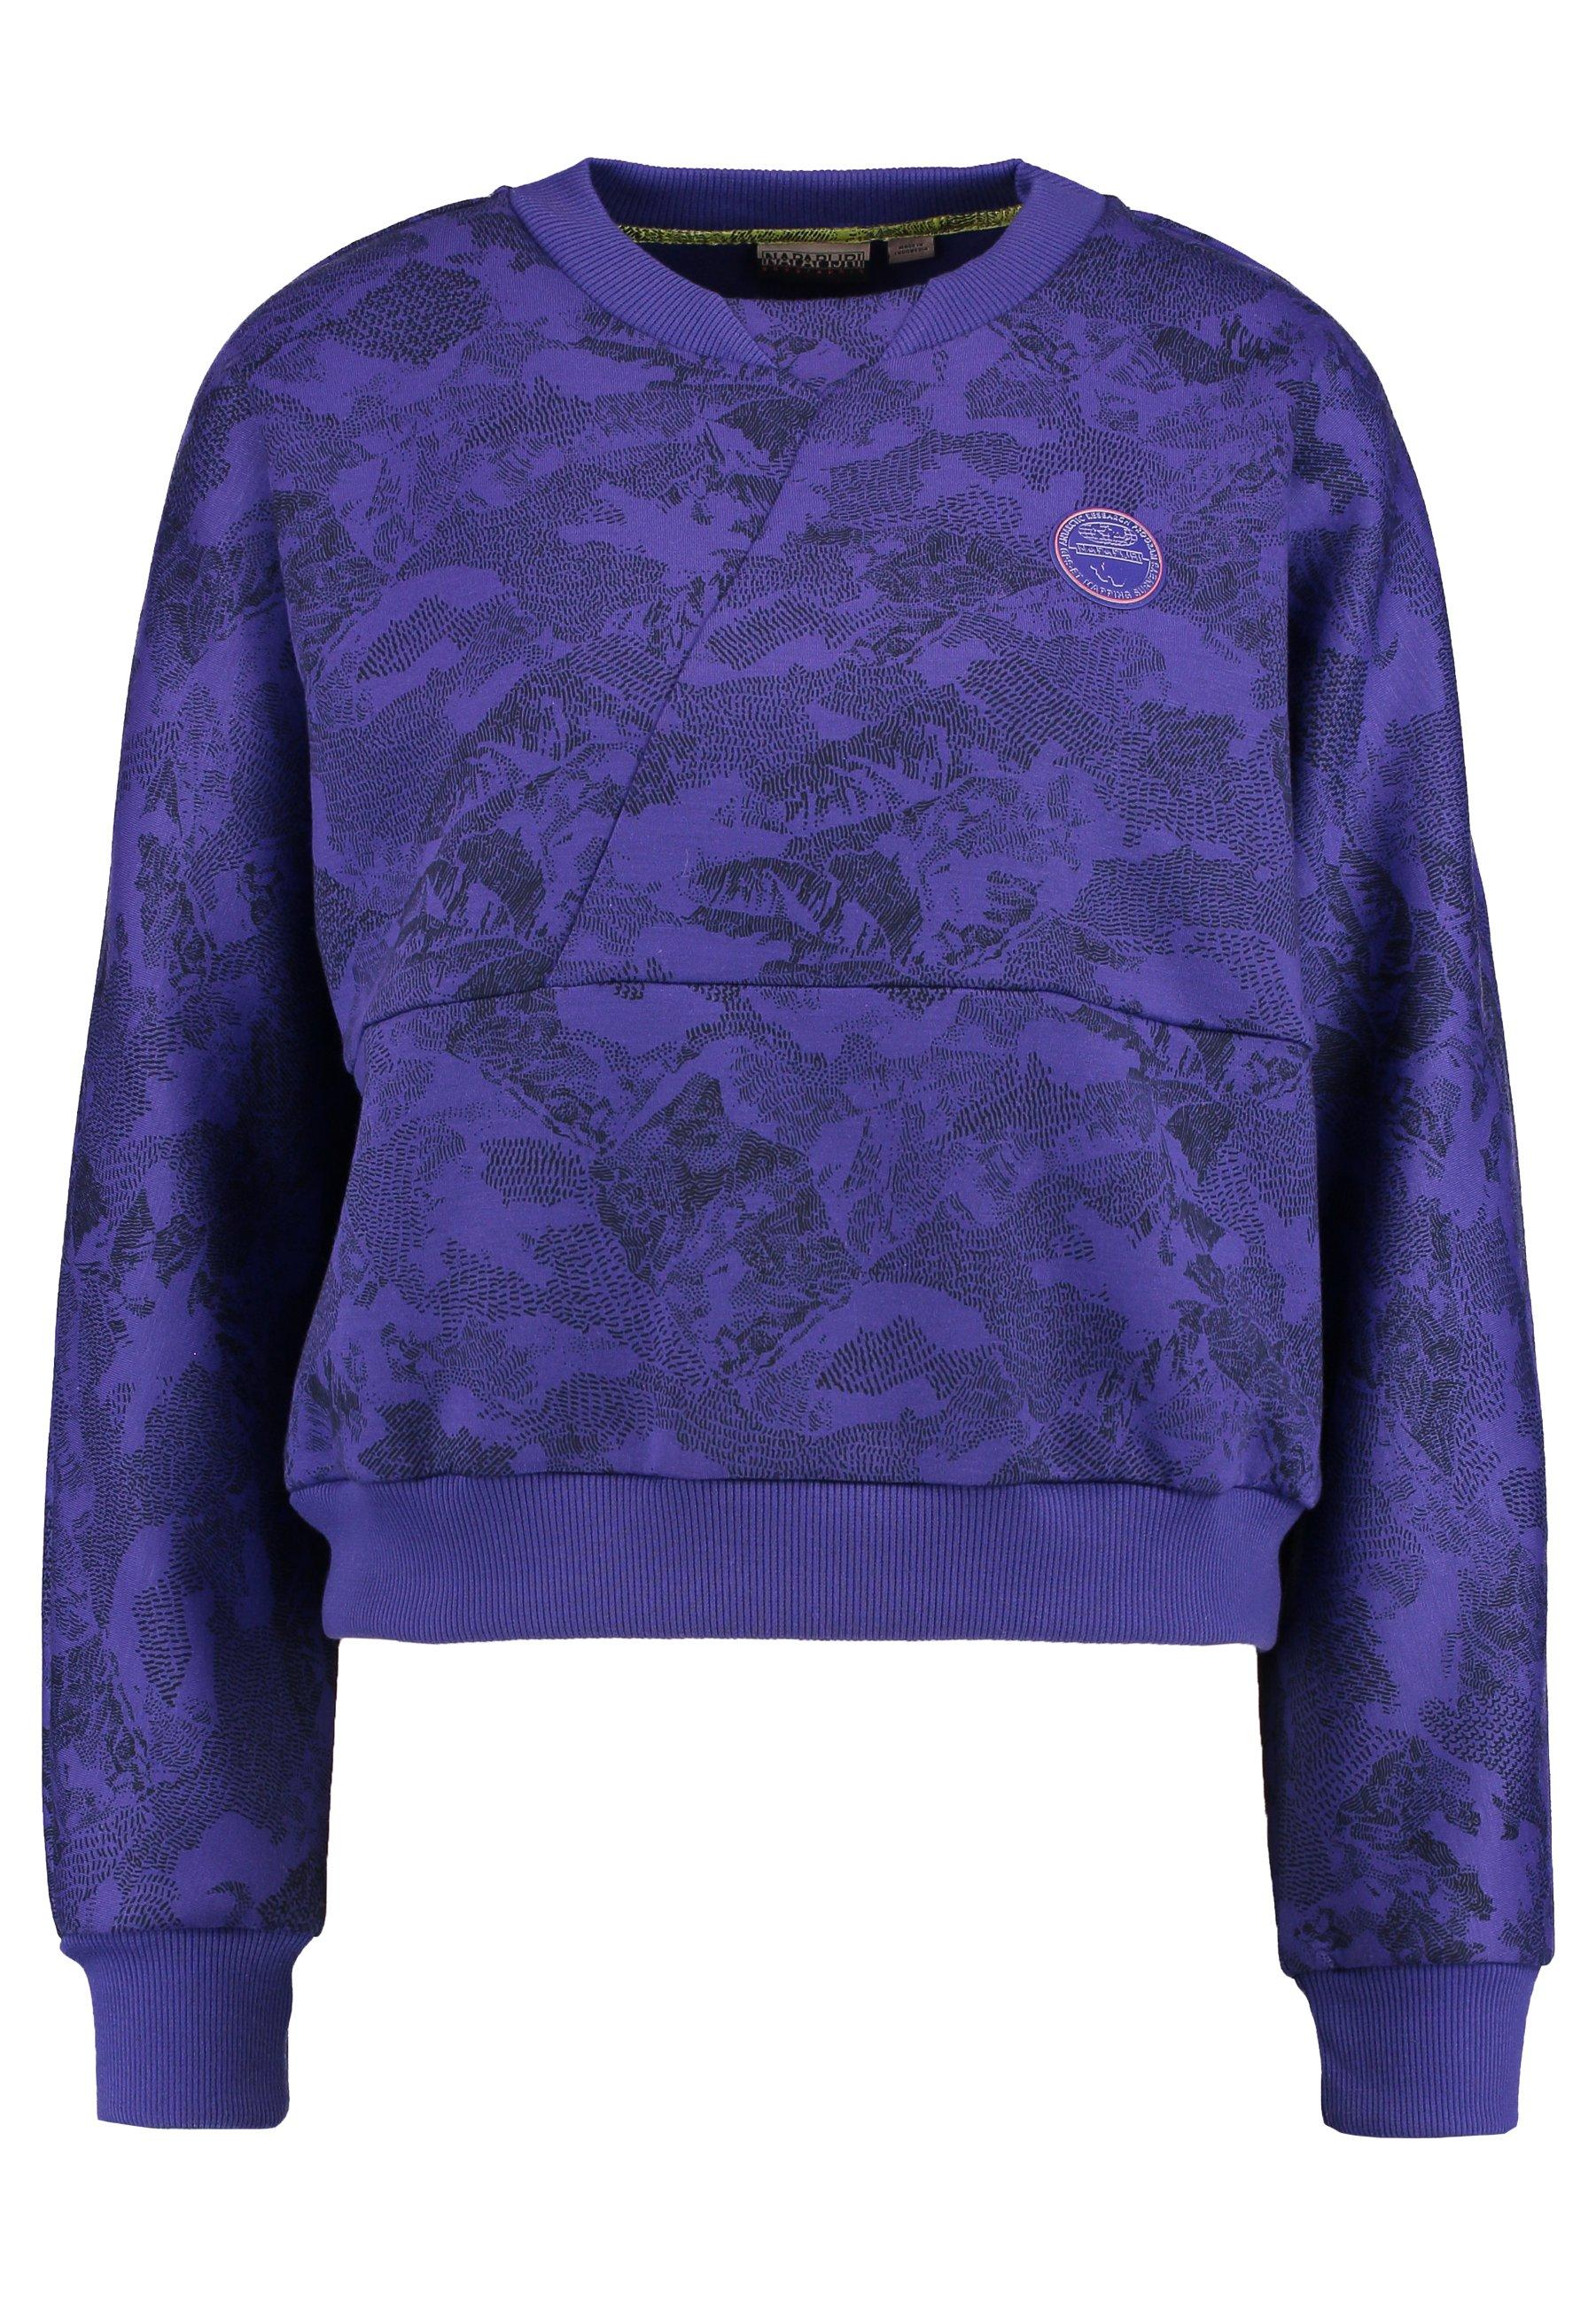 Napapijri Biel Print - Sweater Fantasy DnRzlIv3